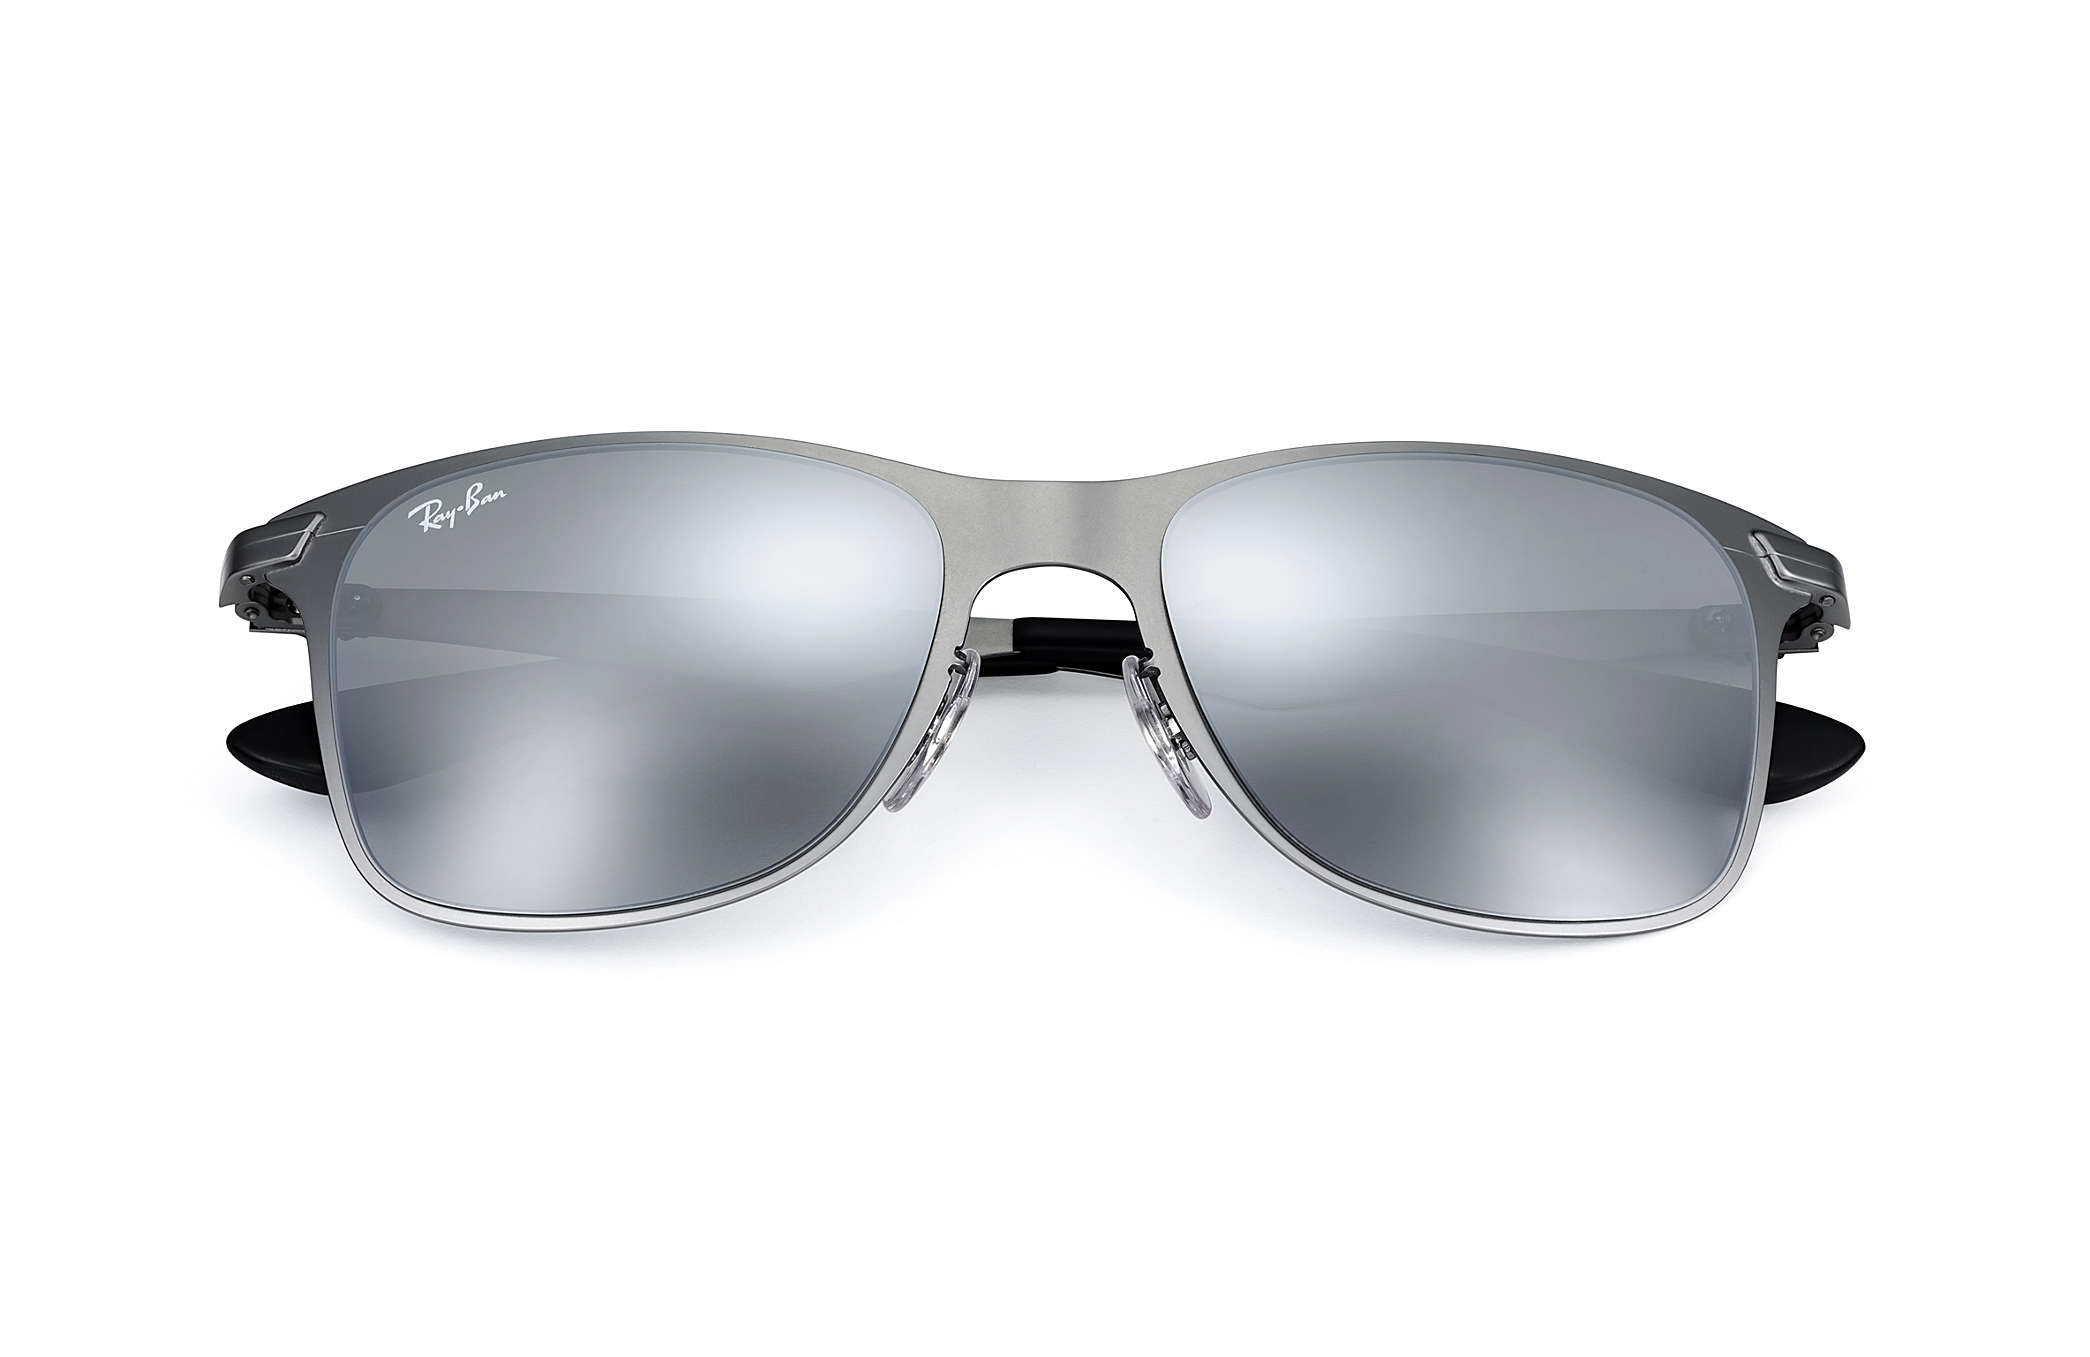 Ray Ban Wayfarer Flat Metal Matte Gunmetal Grey Silver Mirror Gradient